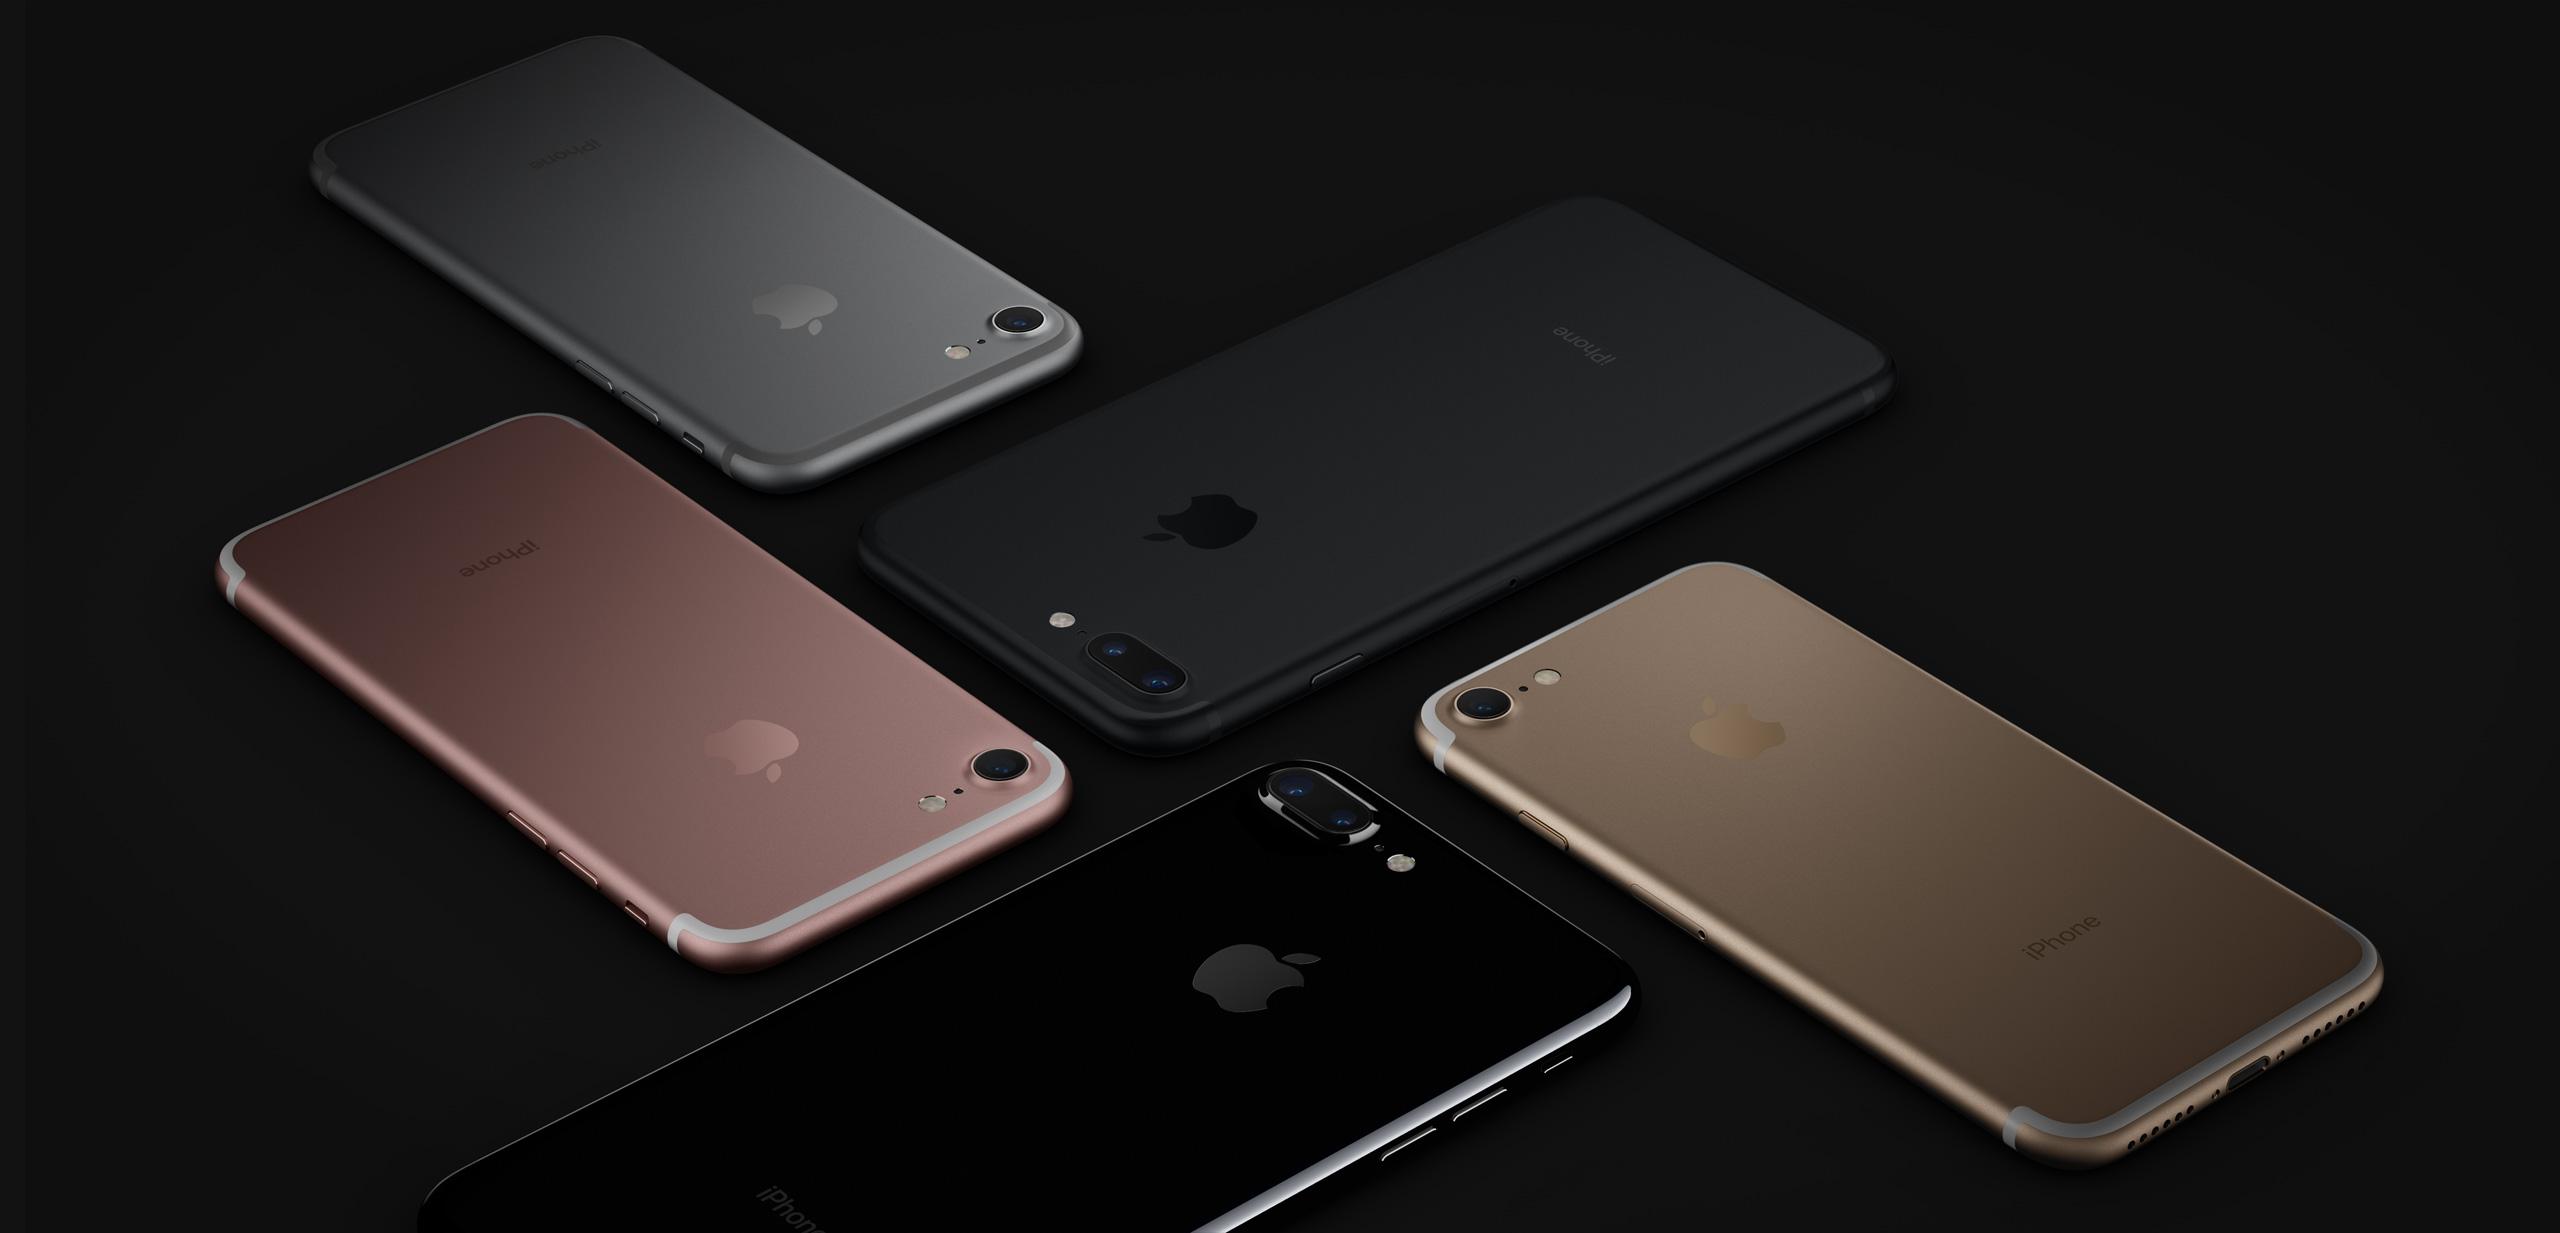 http://images.apple.com/v/iphone-7/b/images/overview/design_hero_large.jpg